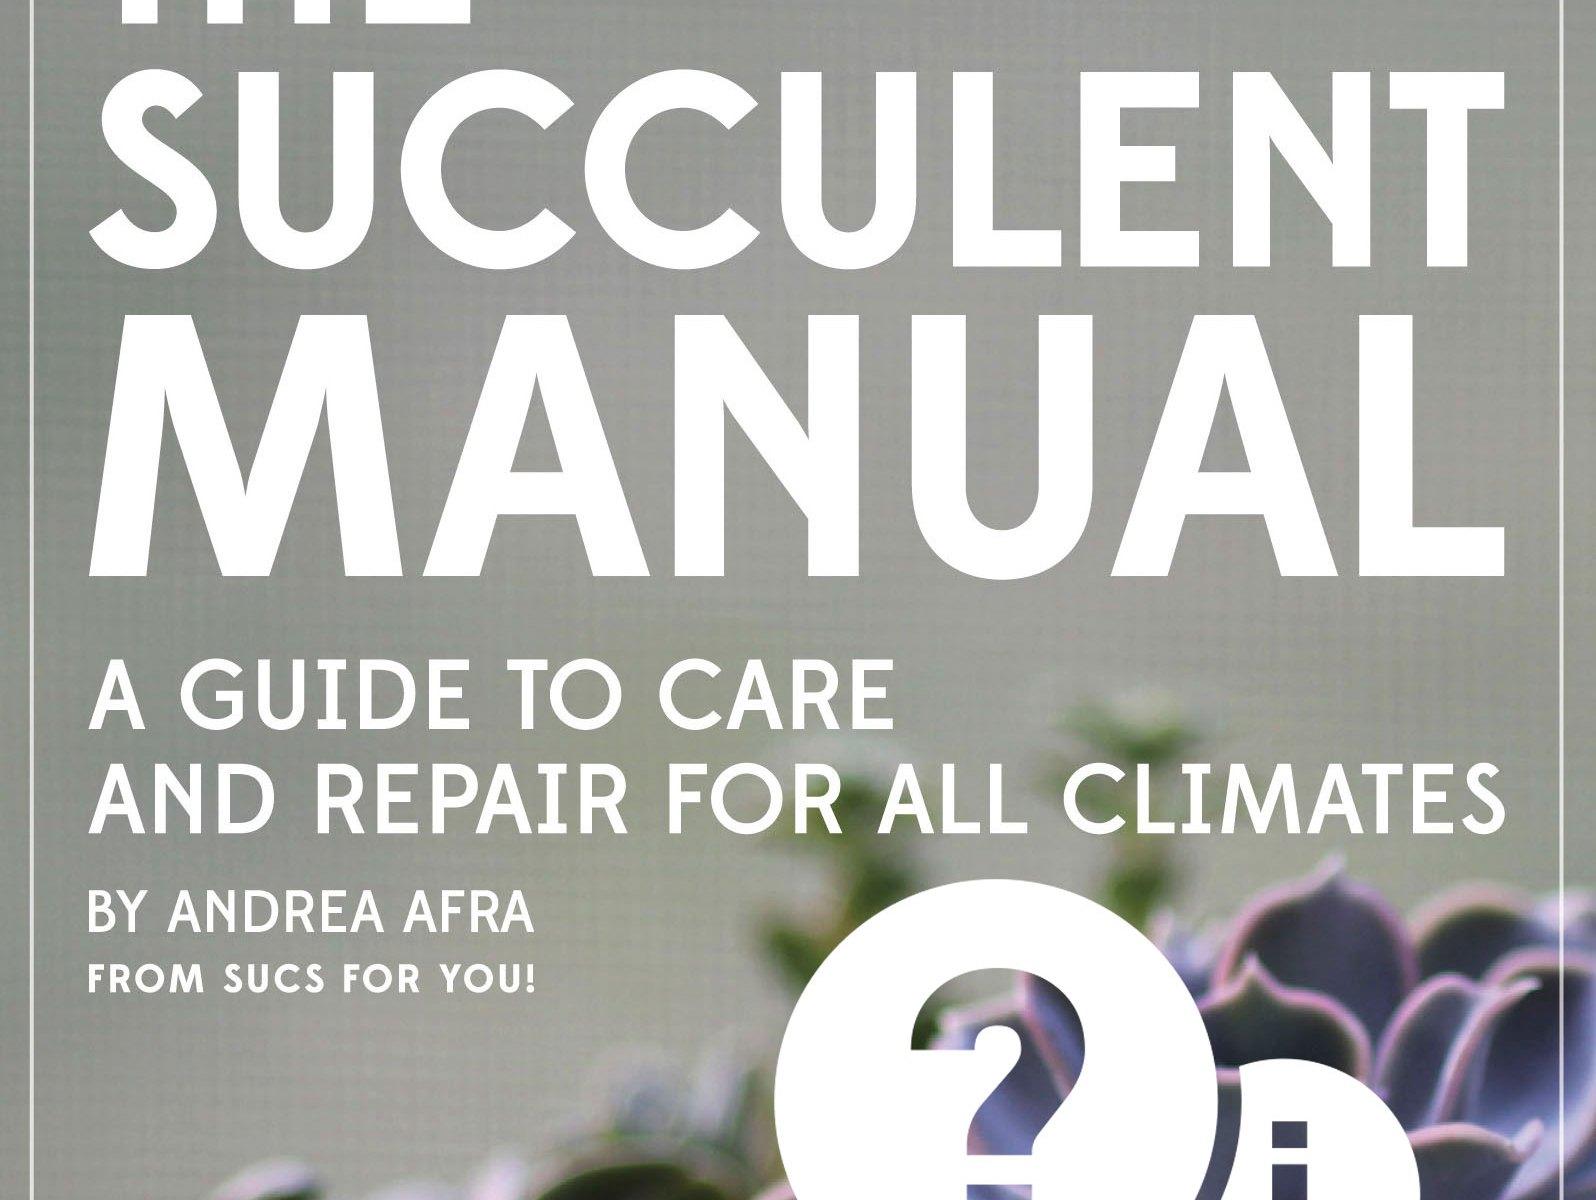 The Succulent Manual